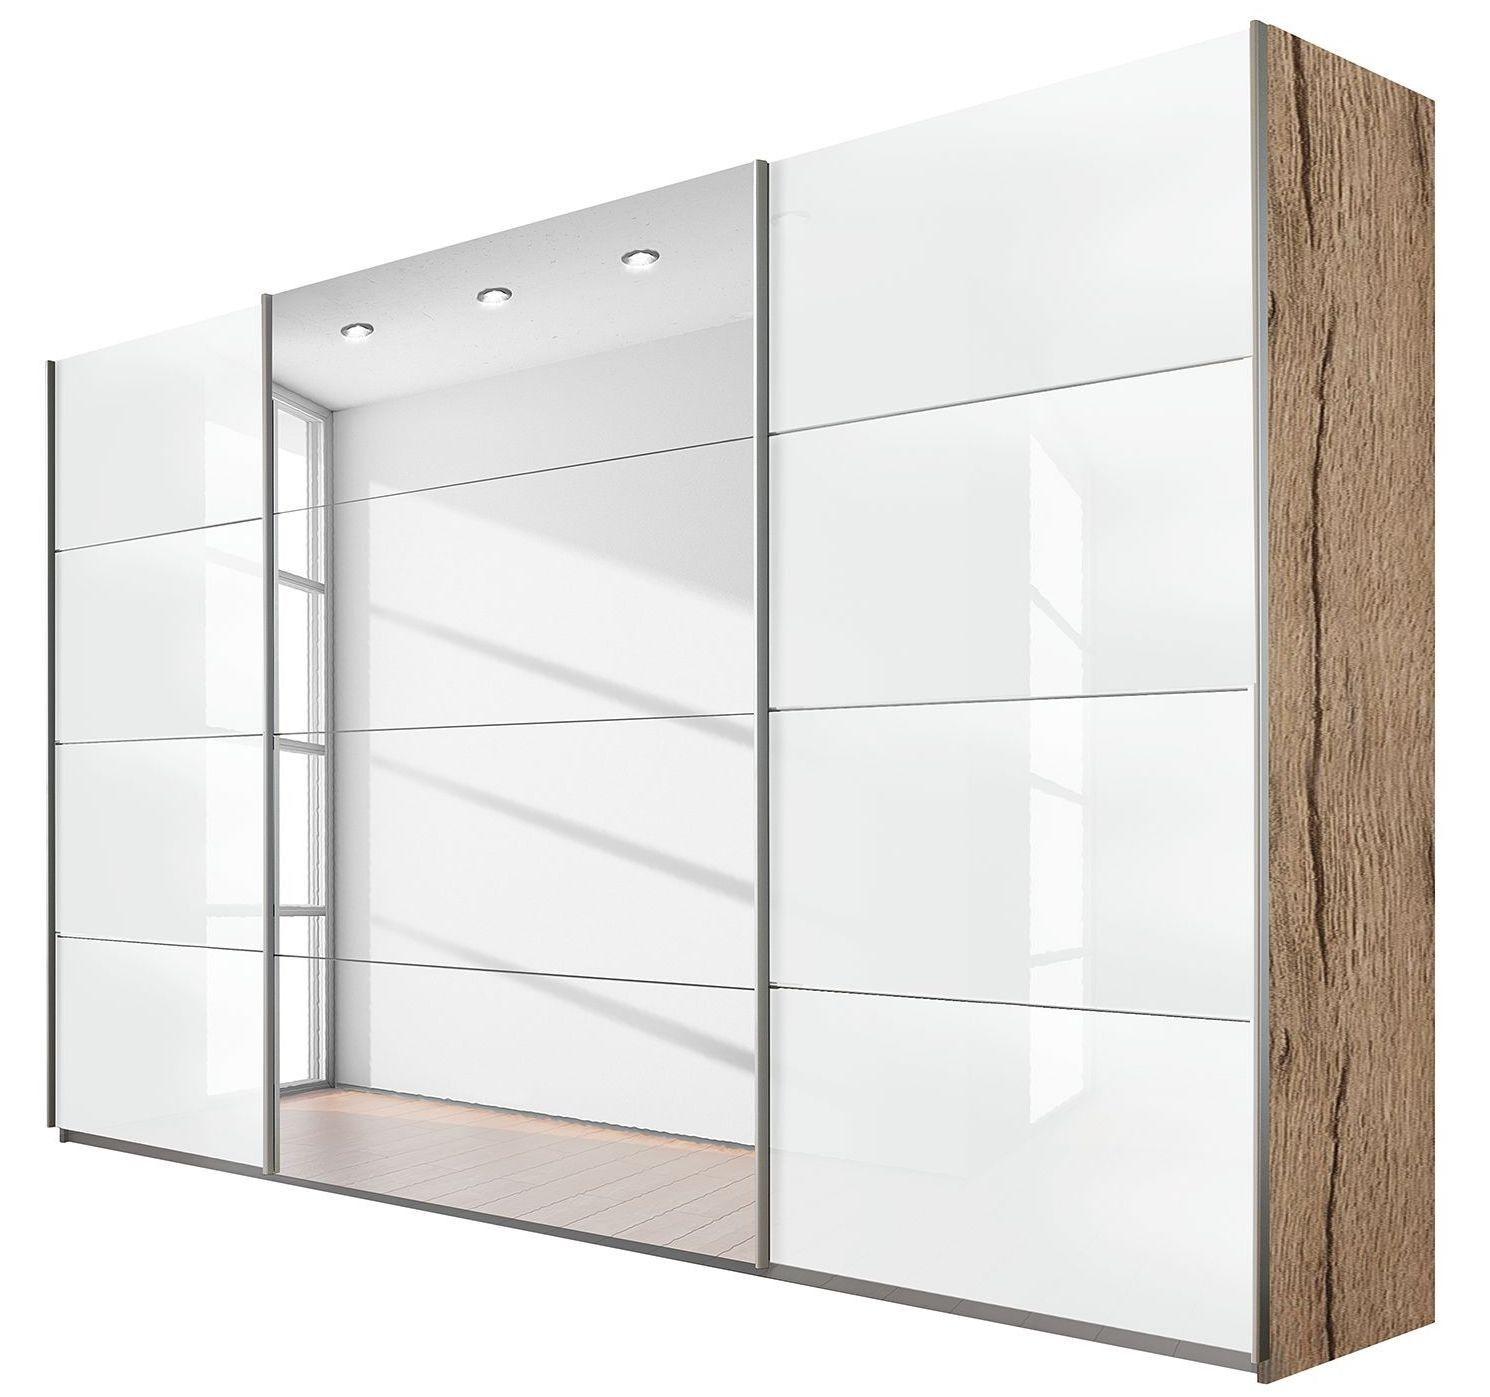 Armoire Design 3 Portes 315 Verre Teinte Blanc Et Chene Clair